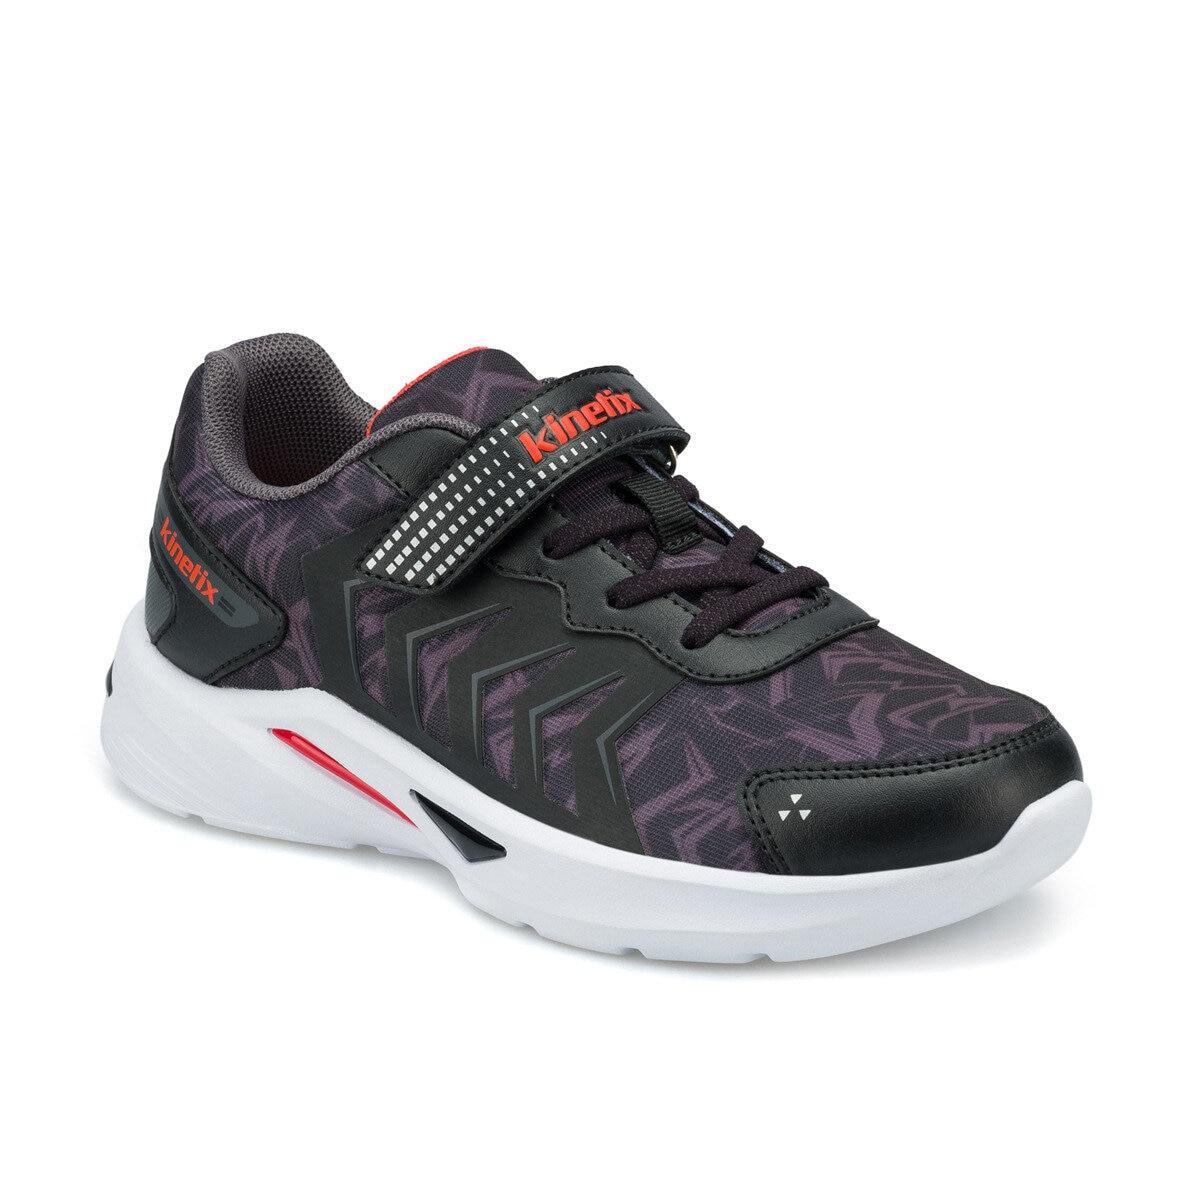 FLO REST Black Male Child Hiking Shoes KINETIX